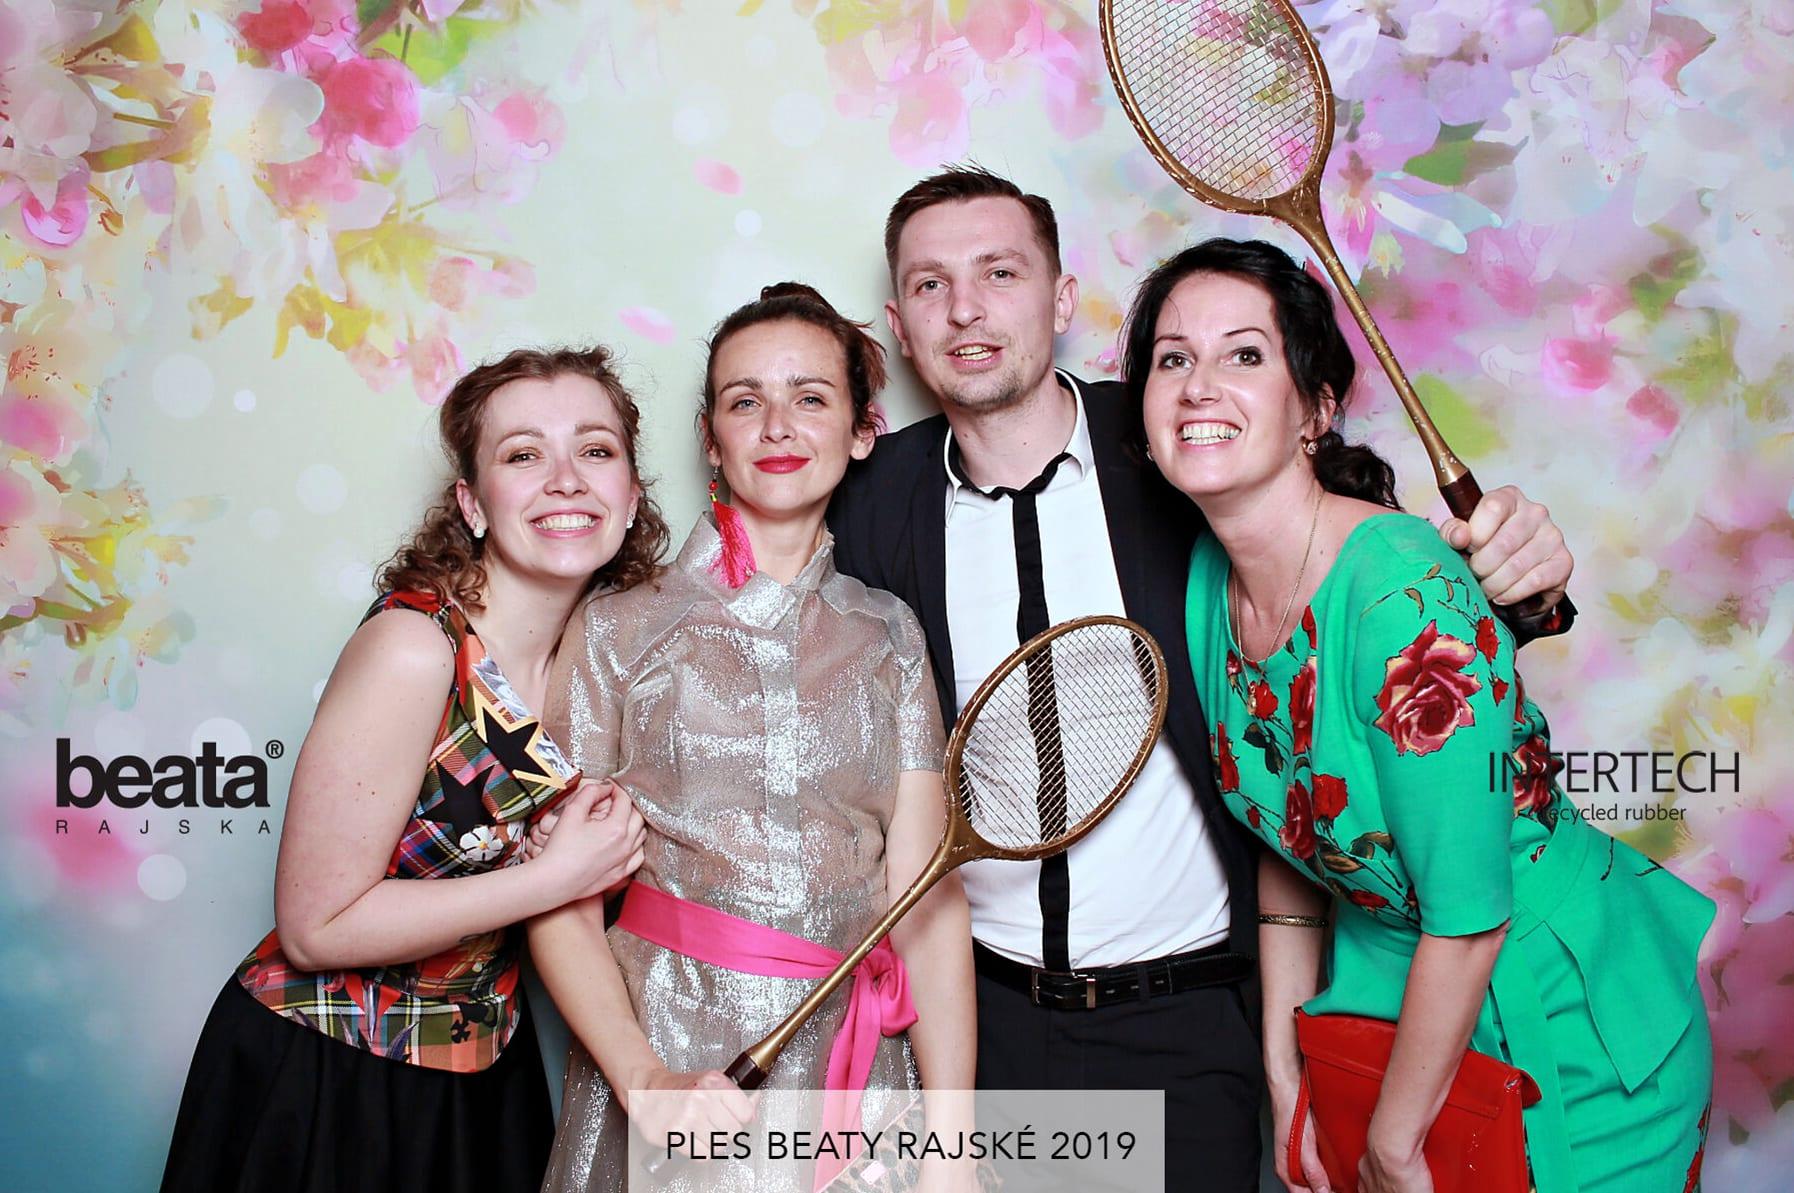 fotokoutek-ples-praha-ples-beaty-rajske-9-3-2019-587651